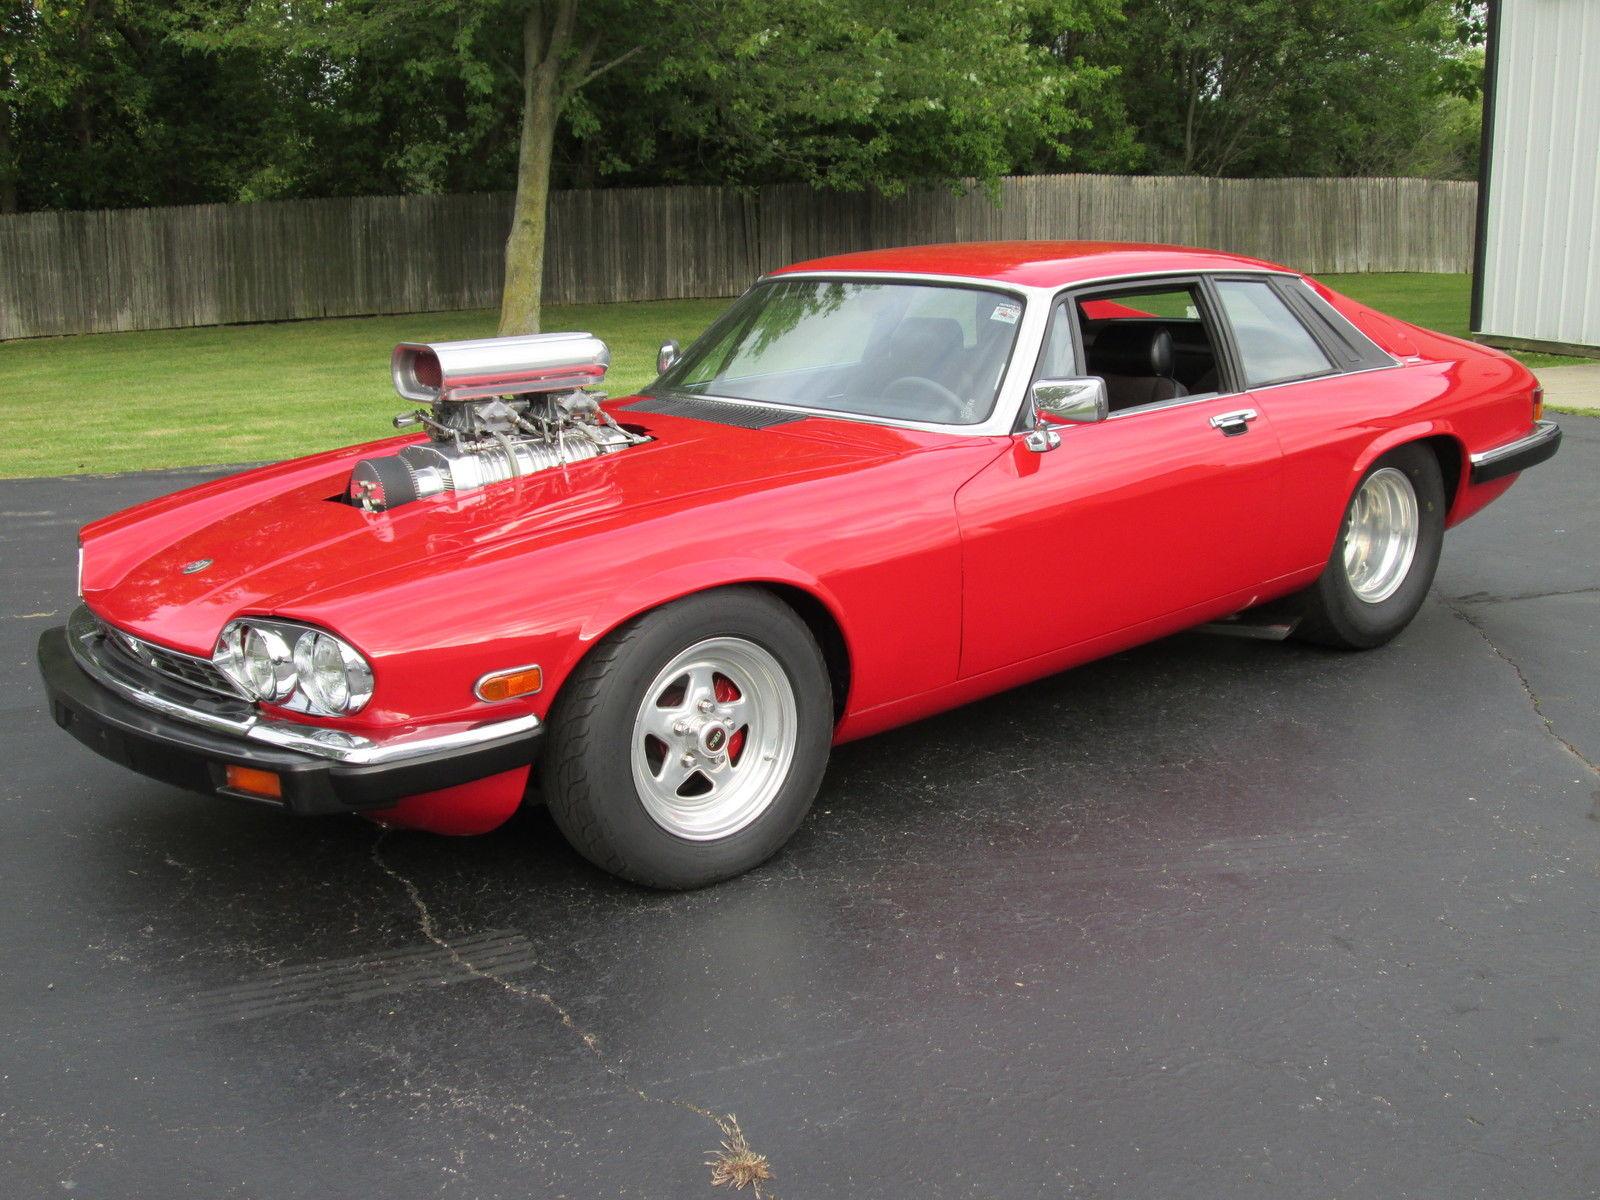 Pro Street Jaguar XJS is Street Legal, Powered by Blown Chevrolet V8 ...